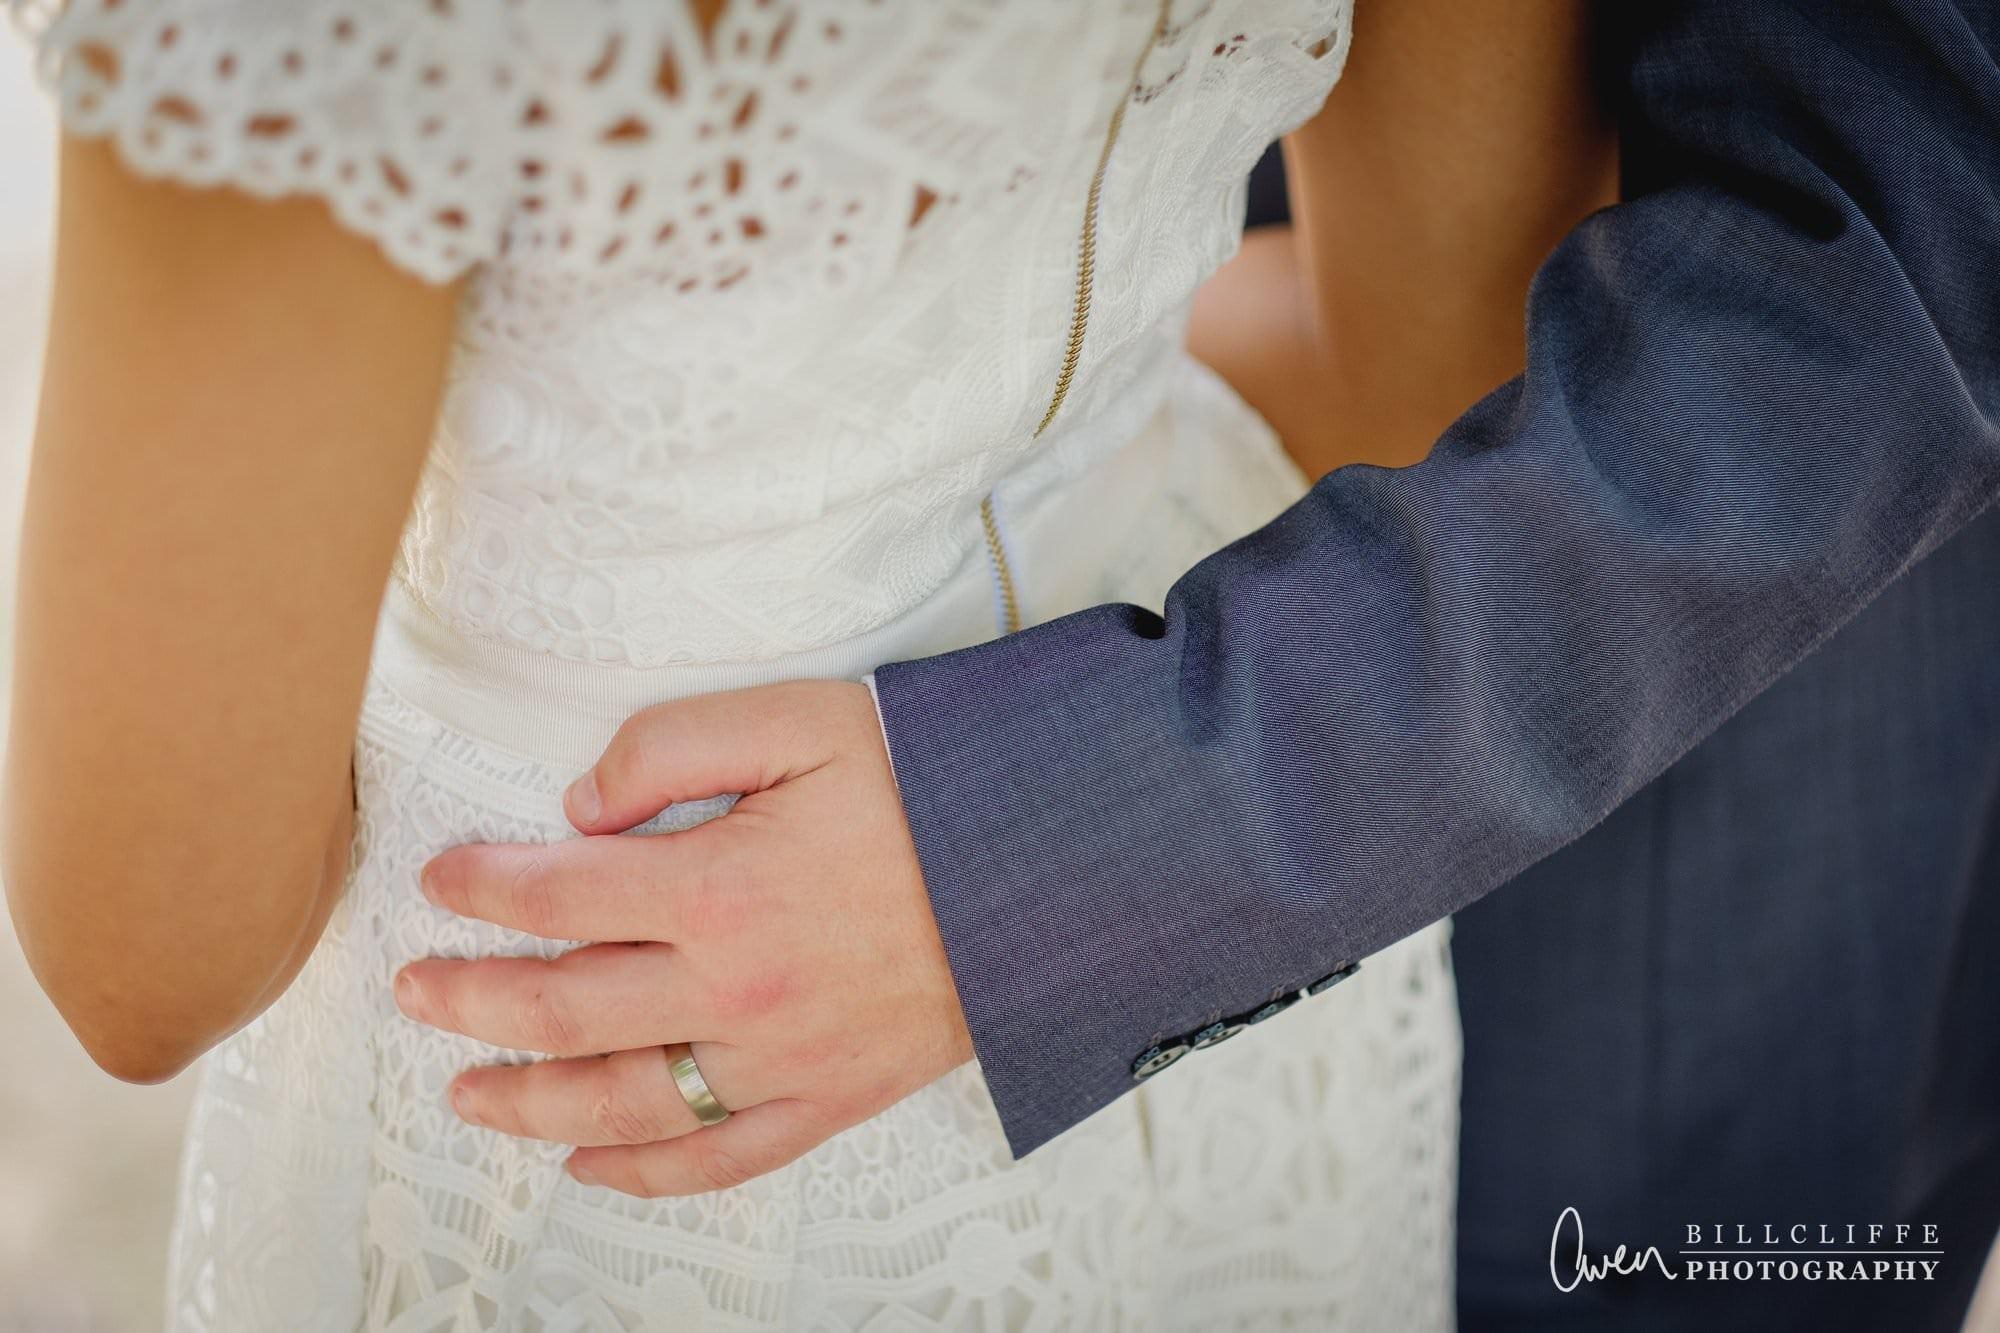 london wedding photographer chelsea old town hall ya 018 - Yasmin + Andy | Chelsea